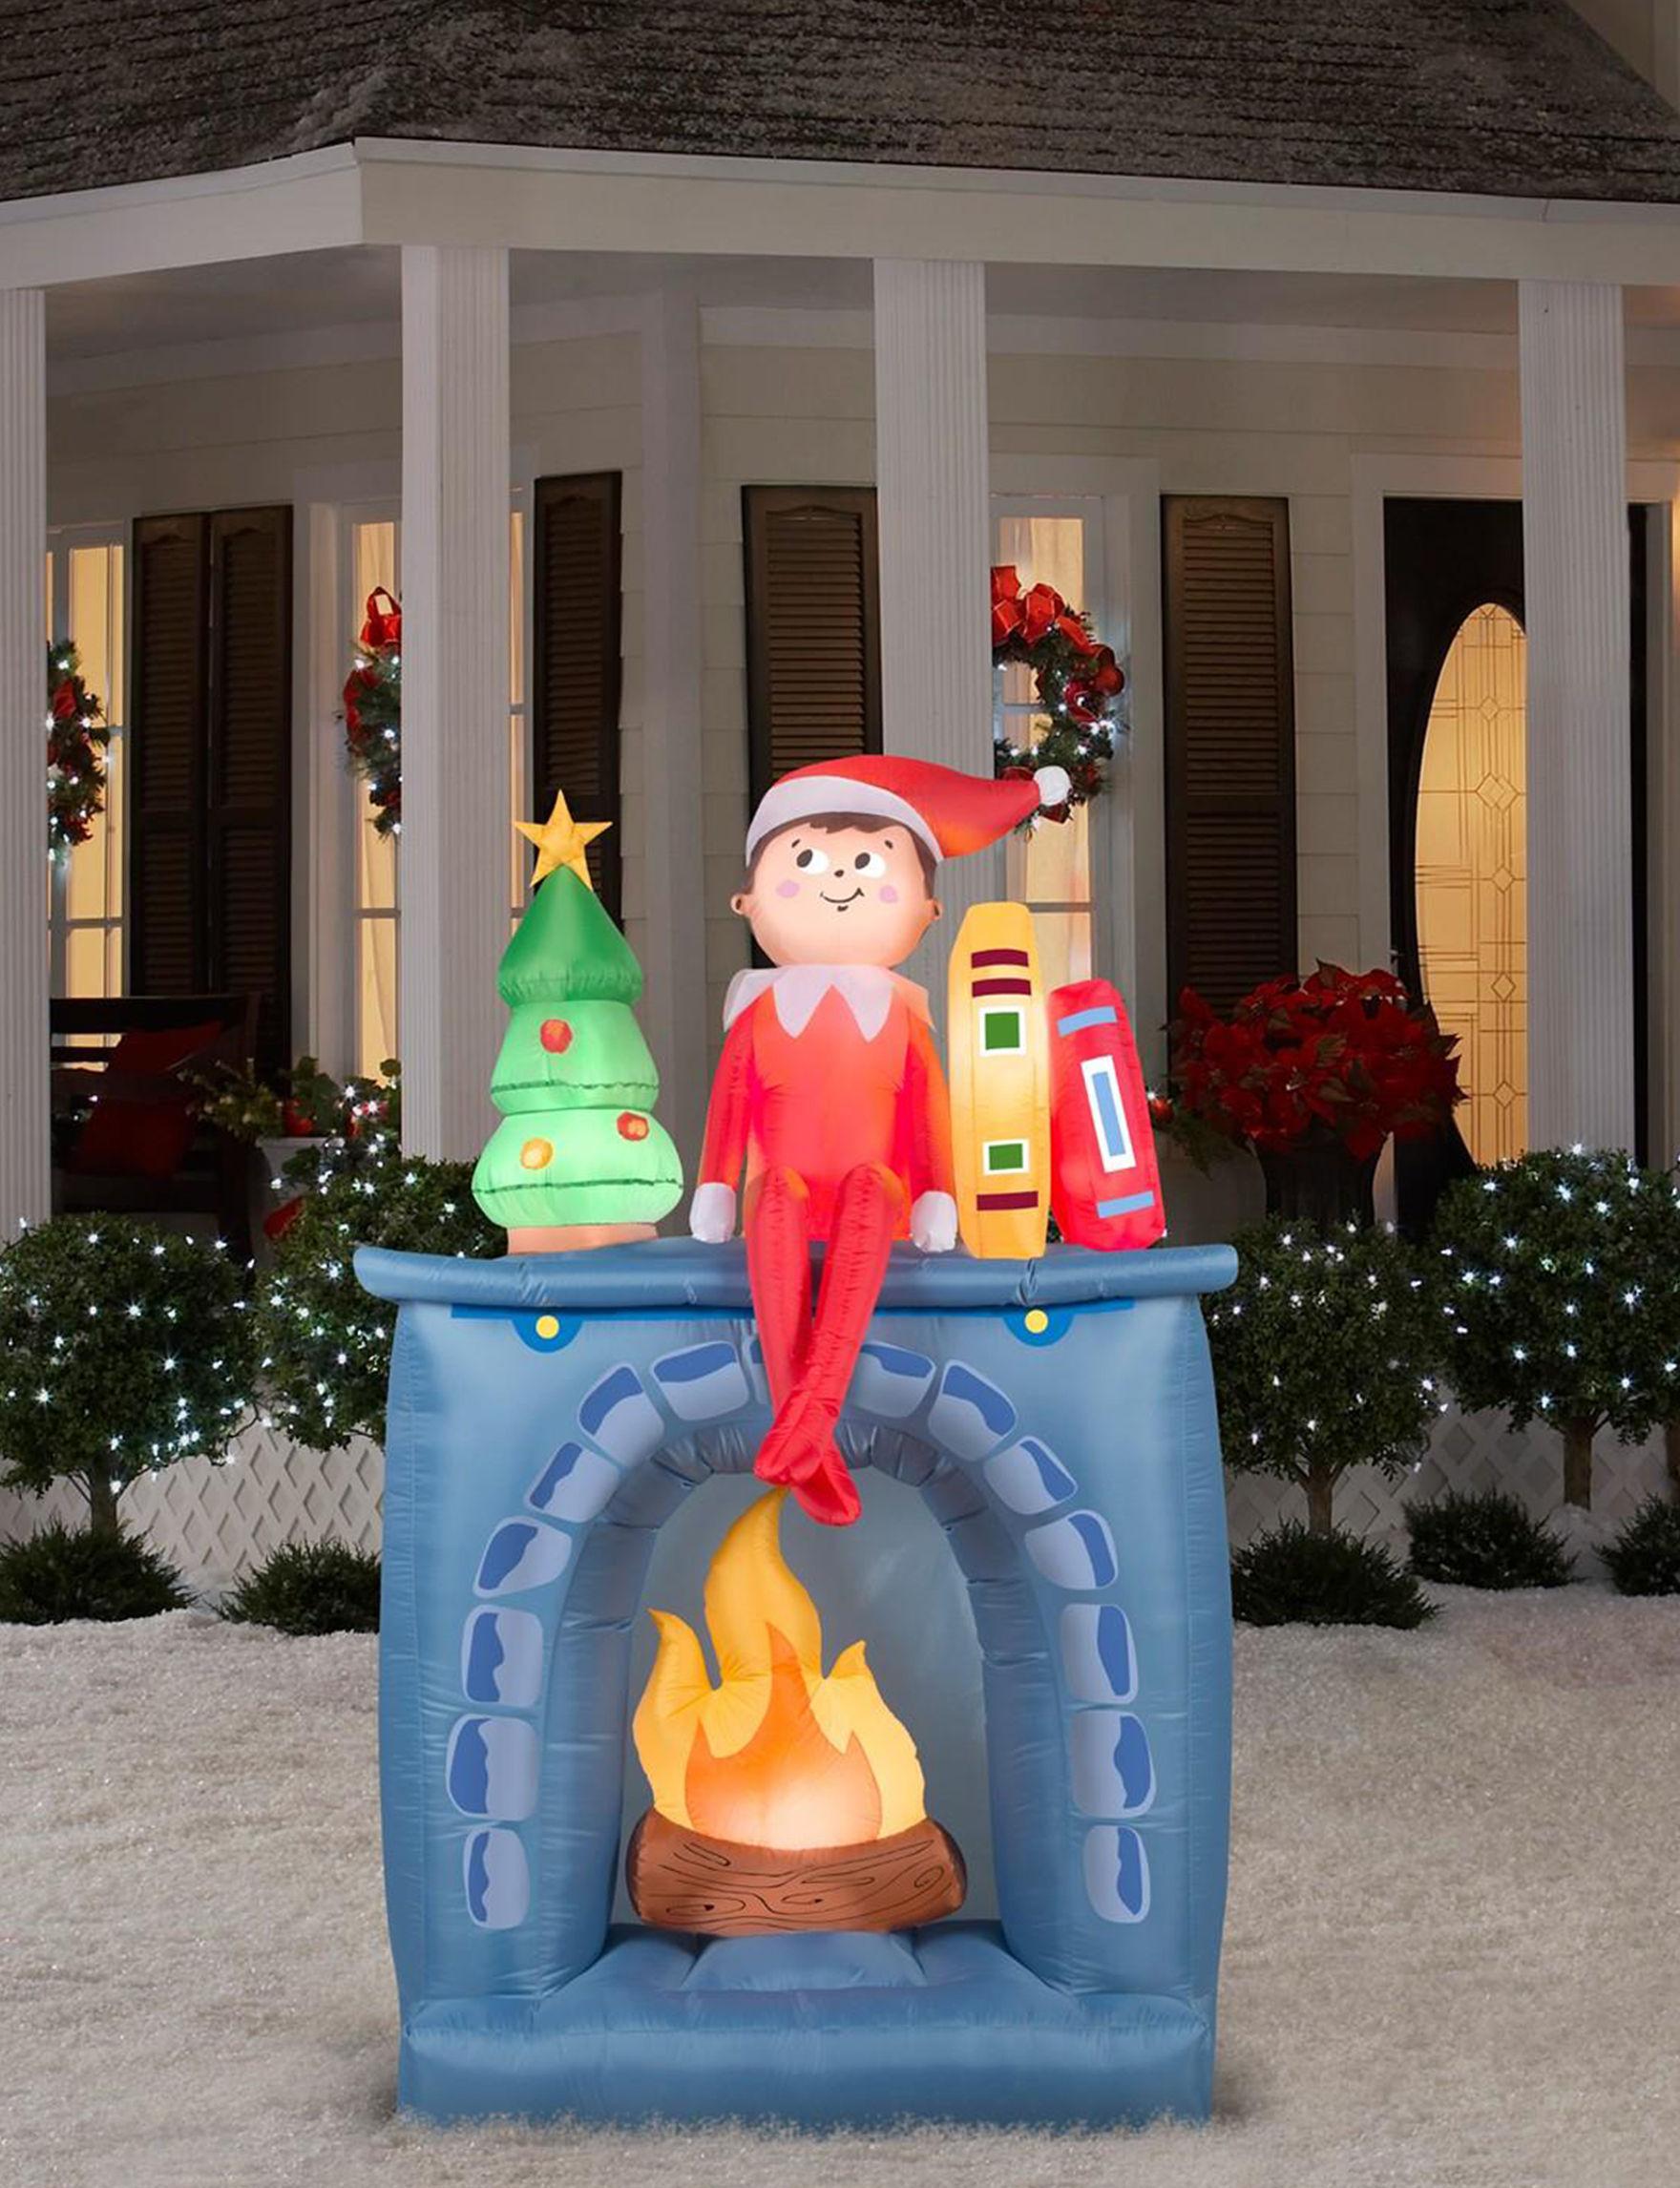 GEMMY Blue Multi Decorative Objects Outdoor Holiday Decor Planters & Garden Decor Holiday Decor Outdoor Decor